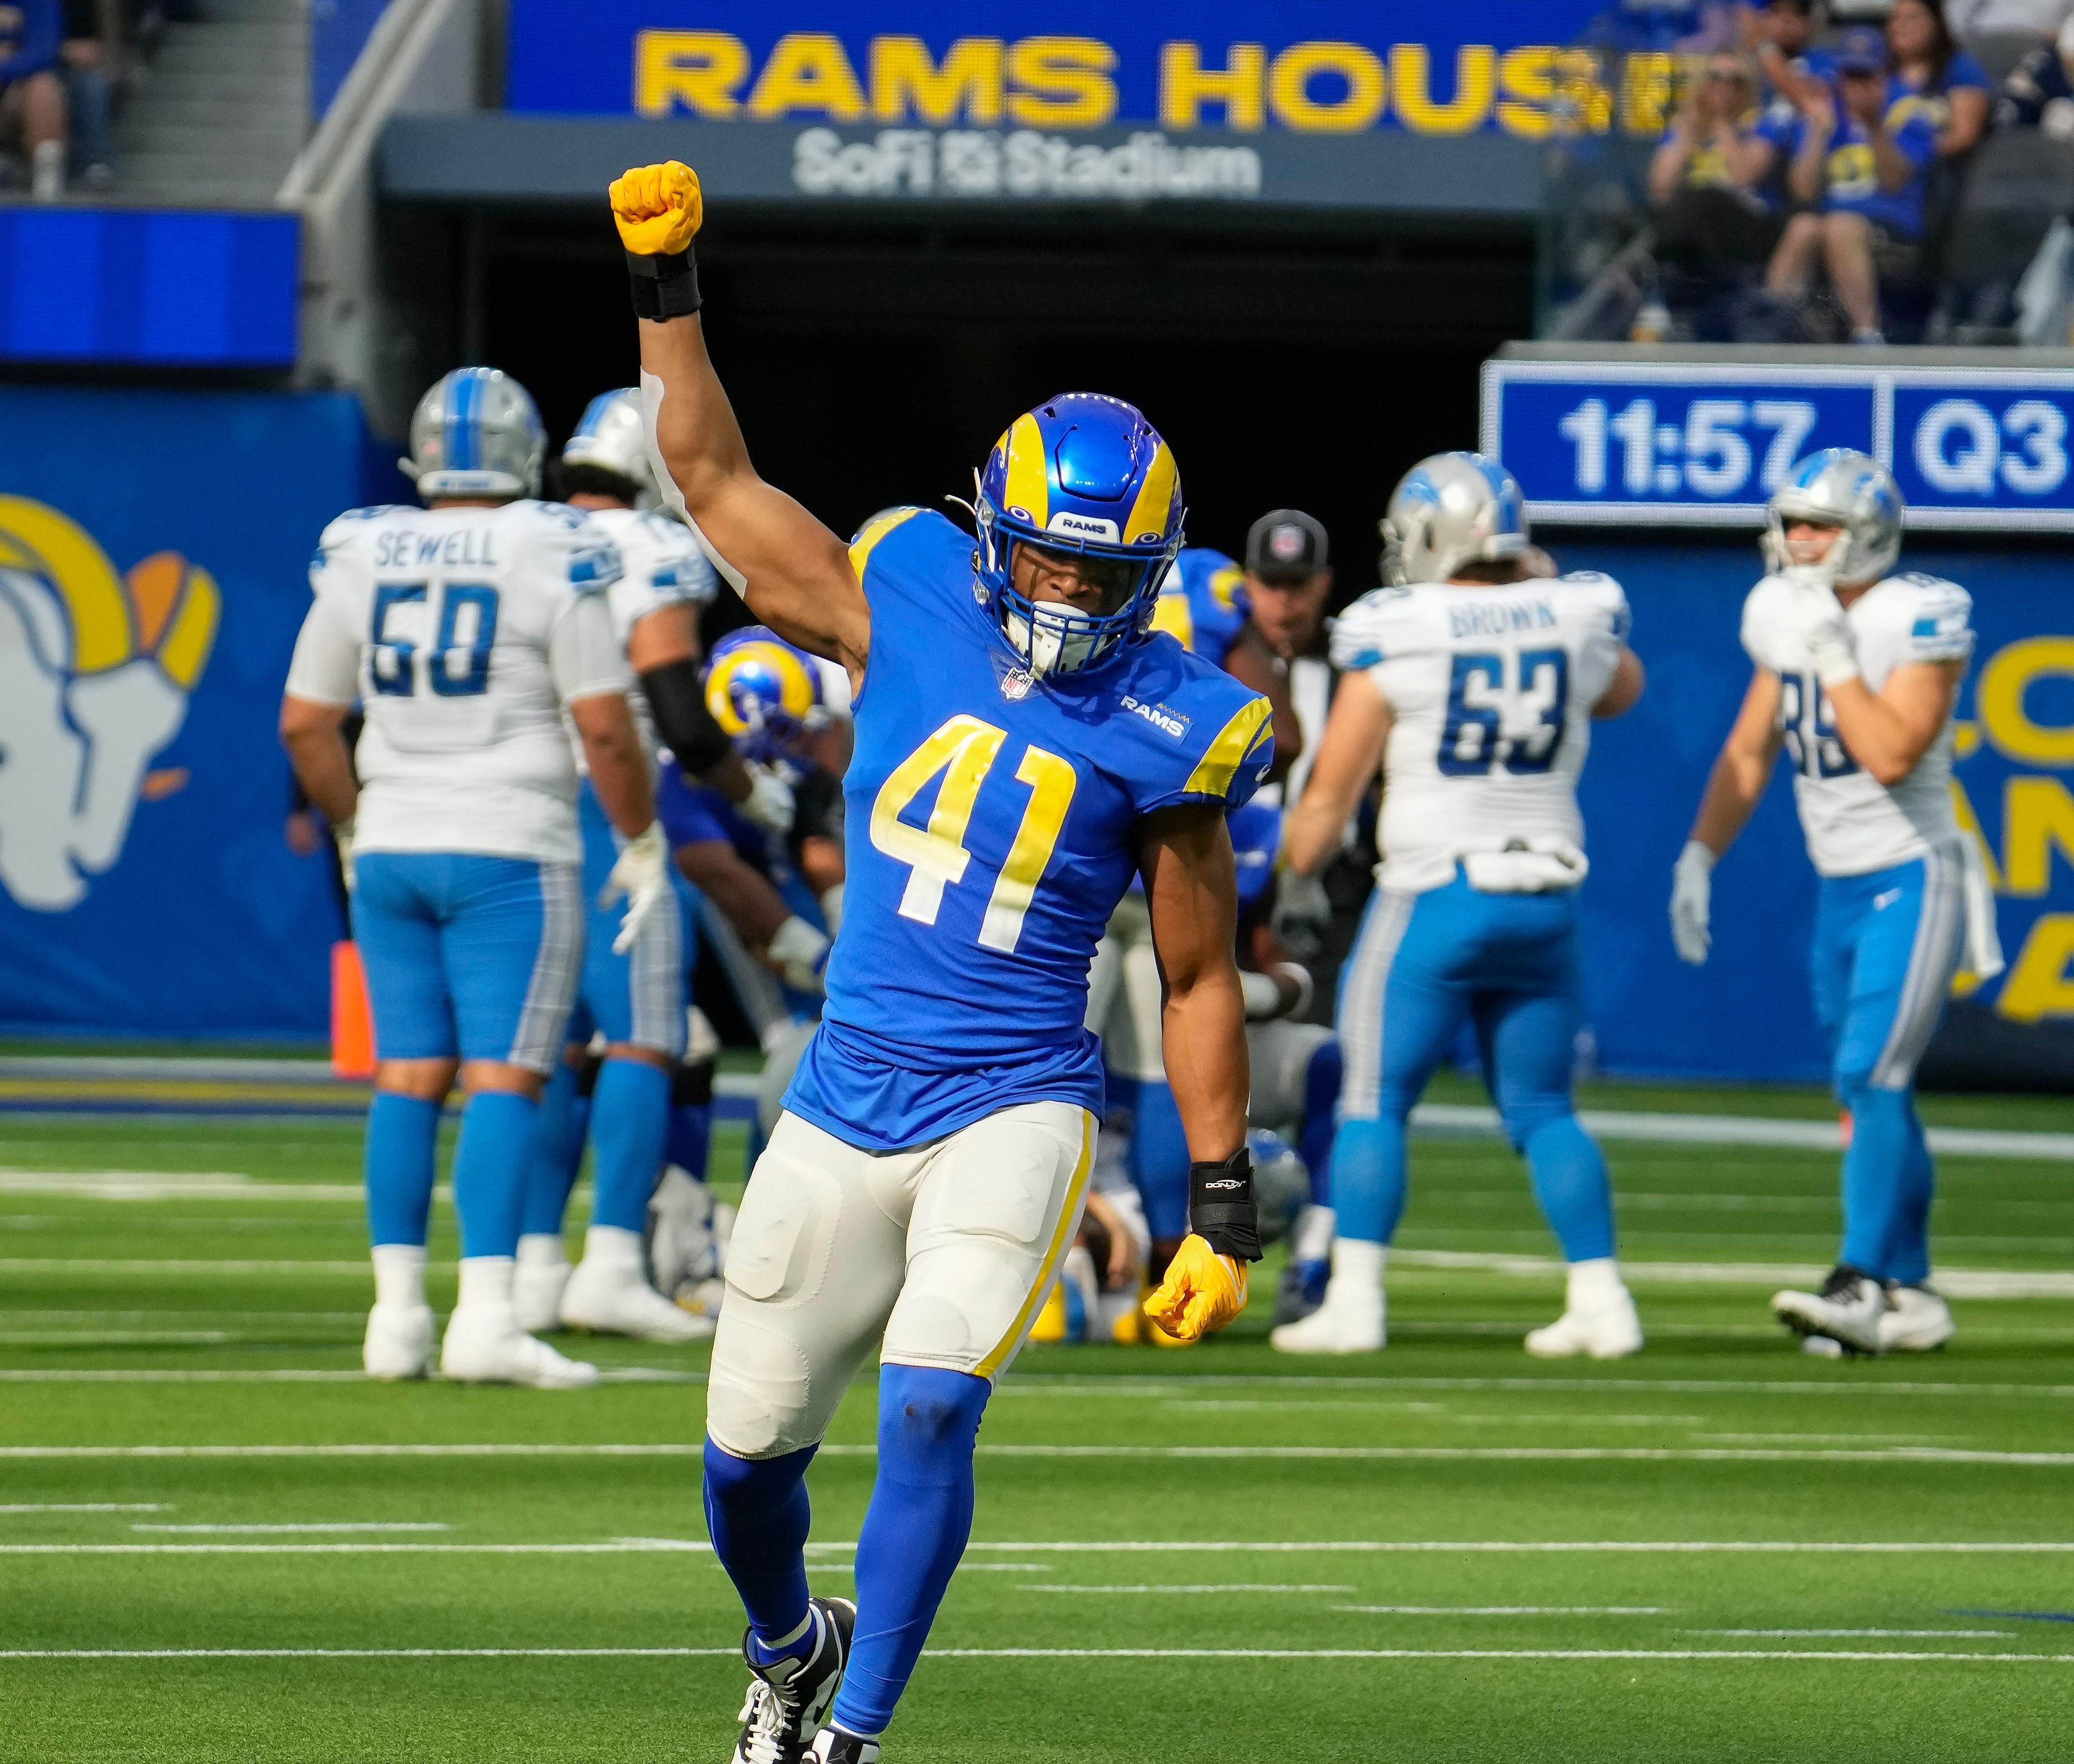 NFL: Detroit Lions at Los Angeles Rams